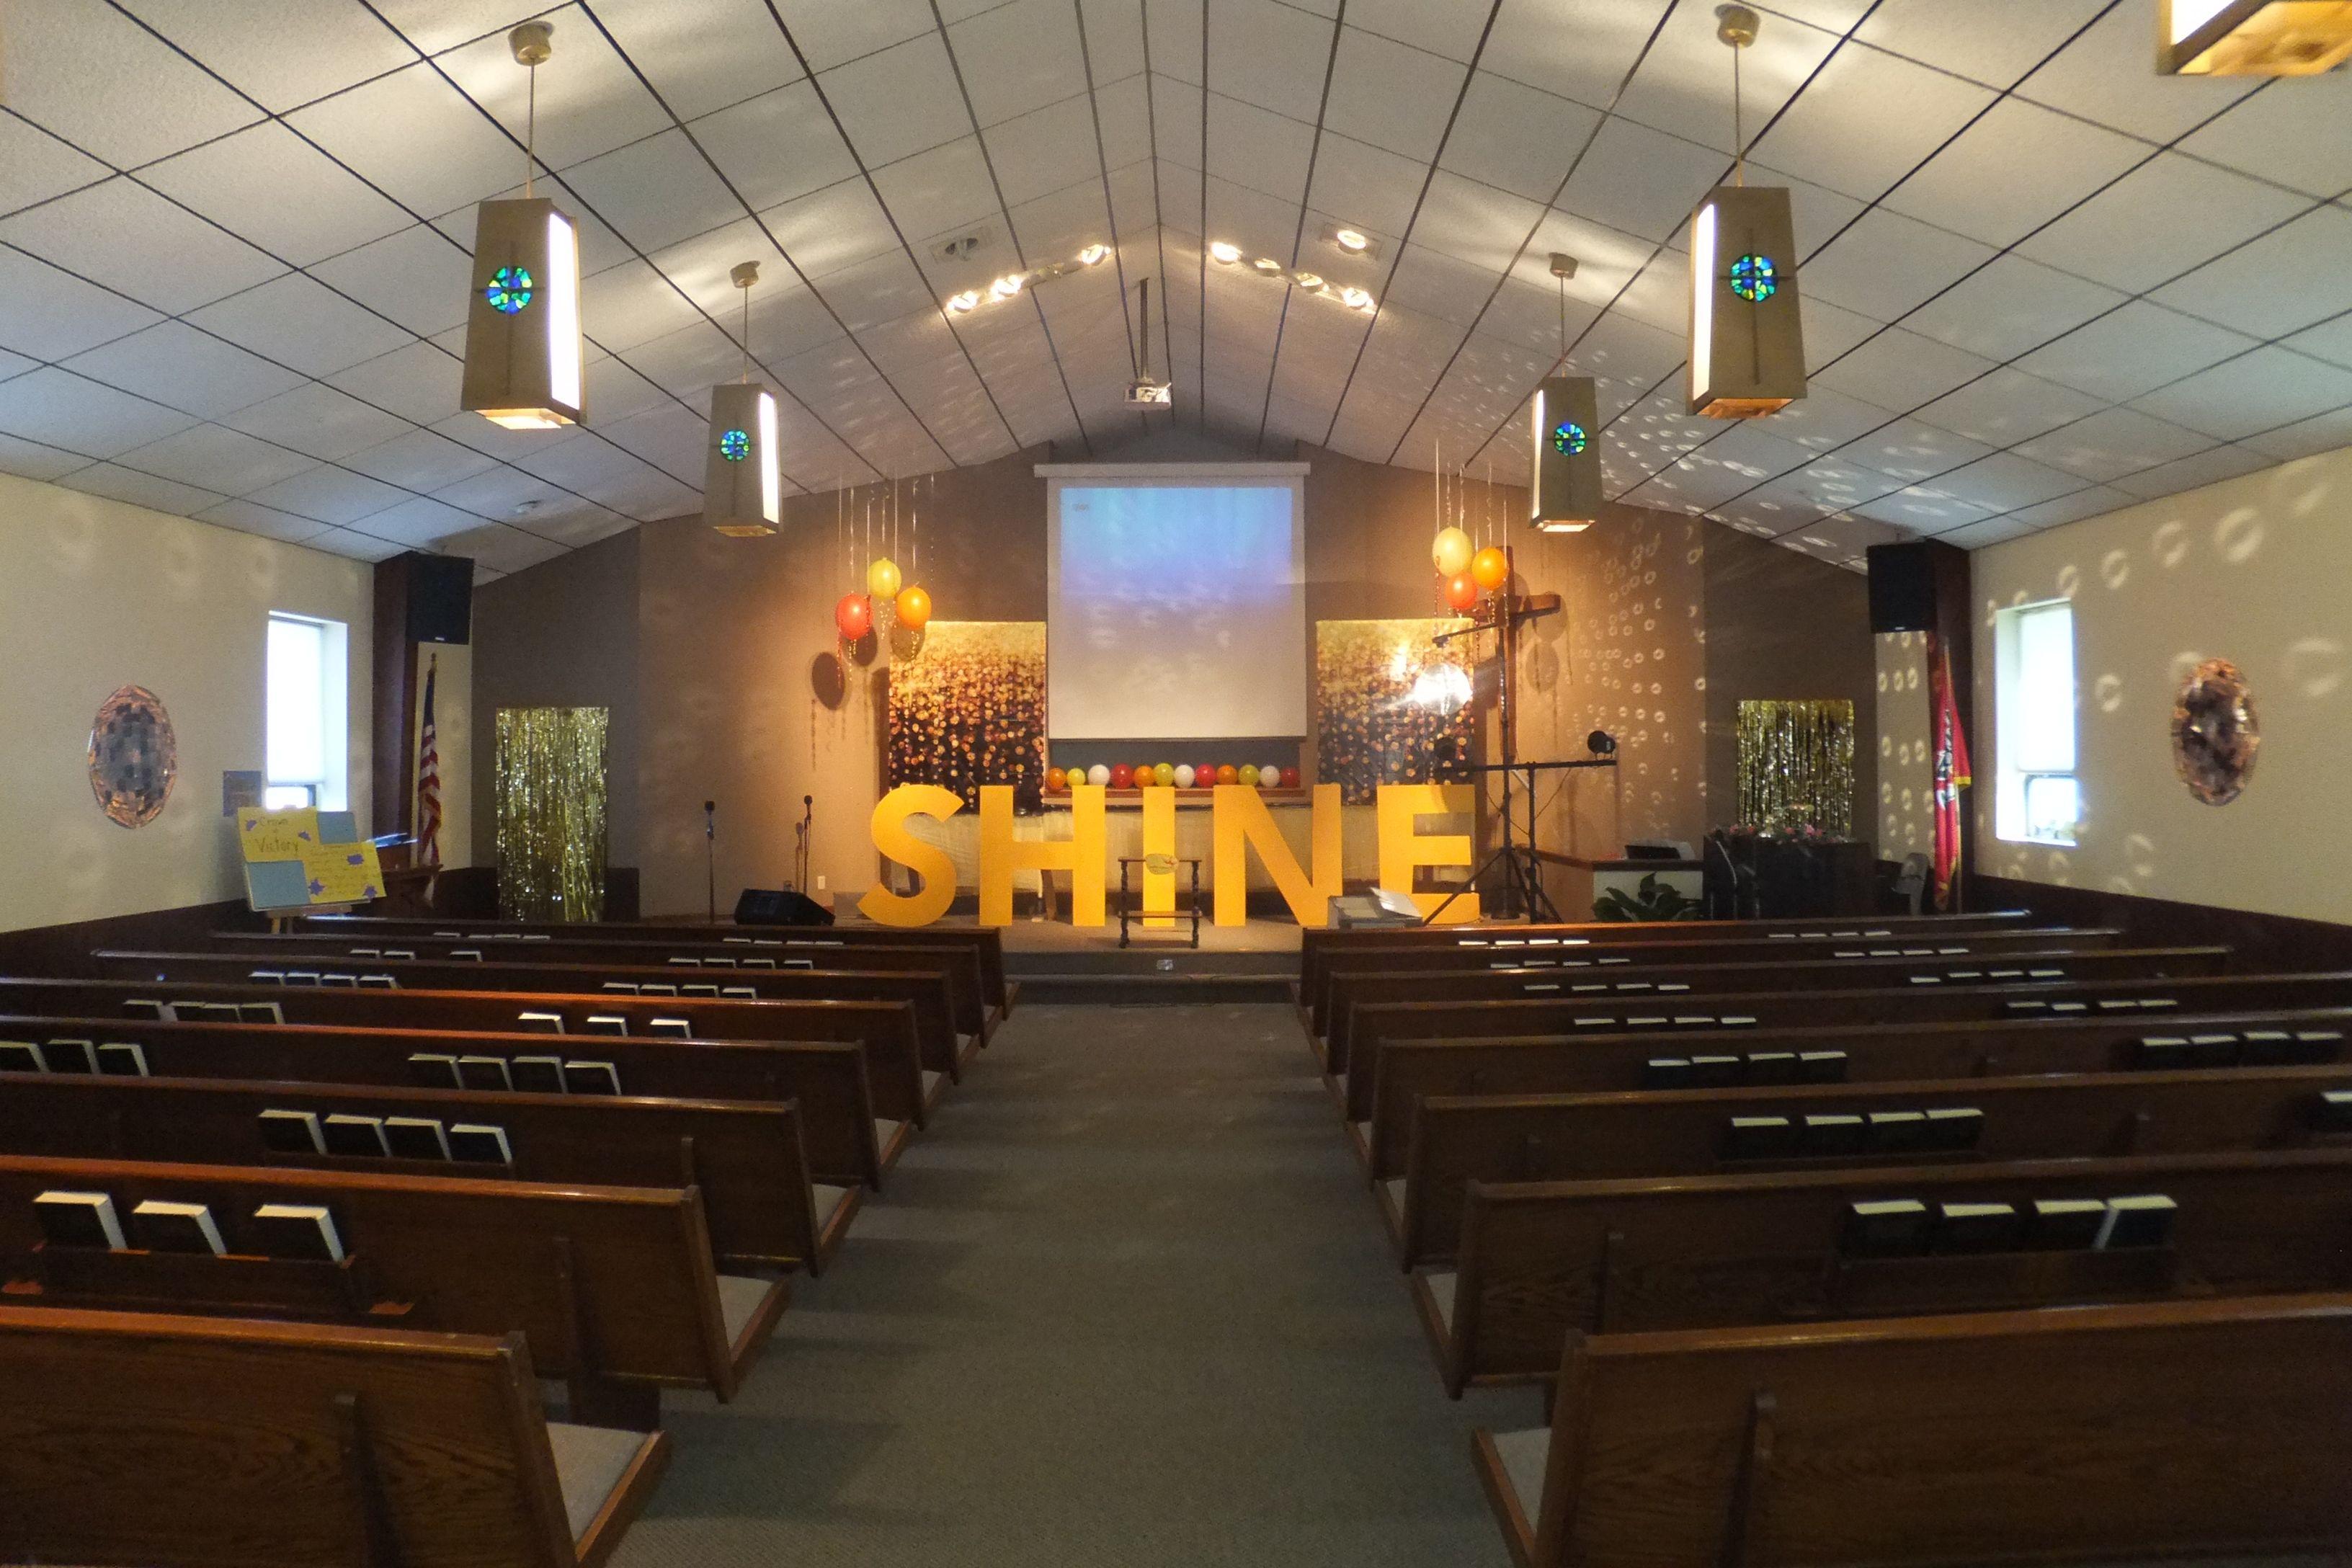 Shine Vbs Opening And Closing Decor Go Fish 2014 Decor Church